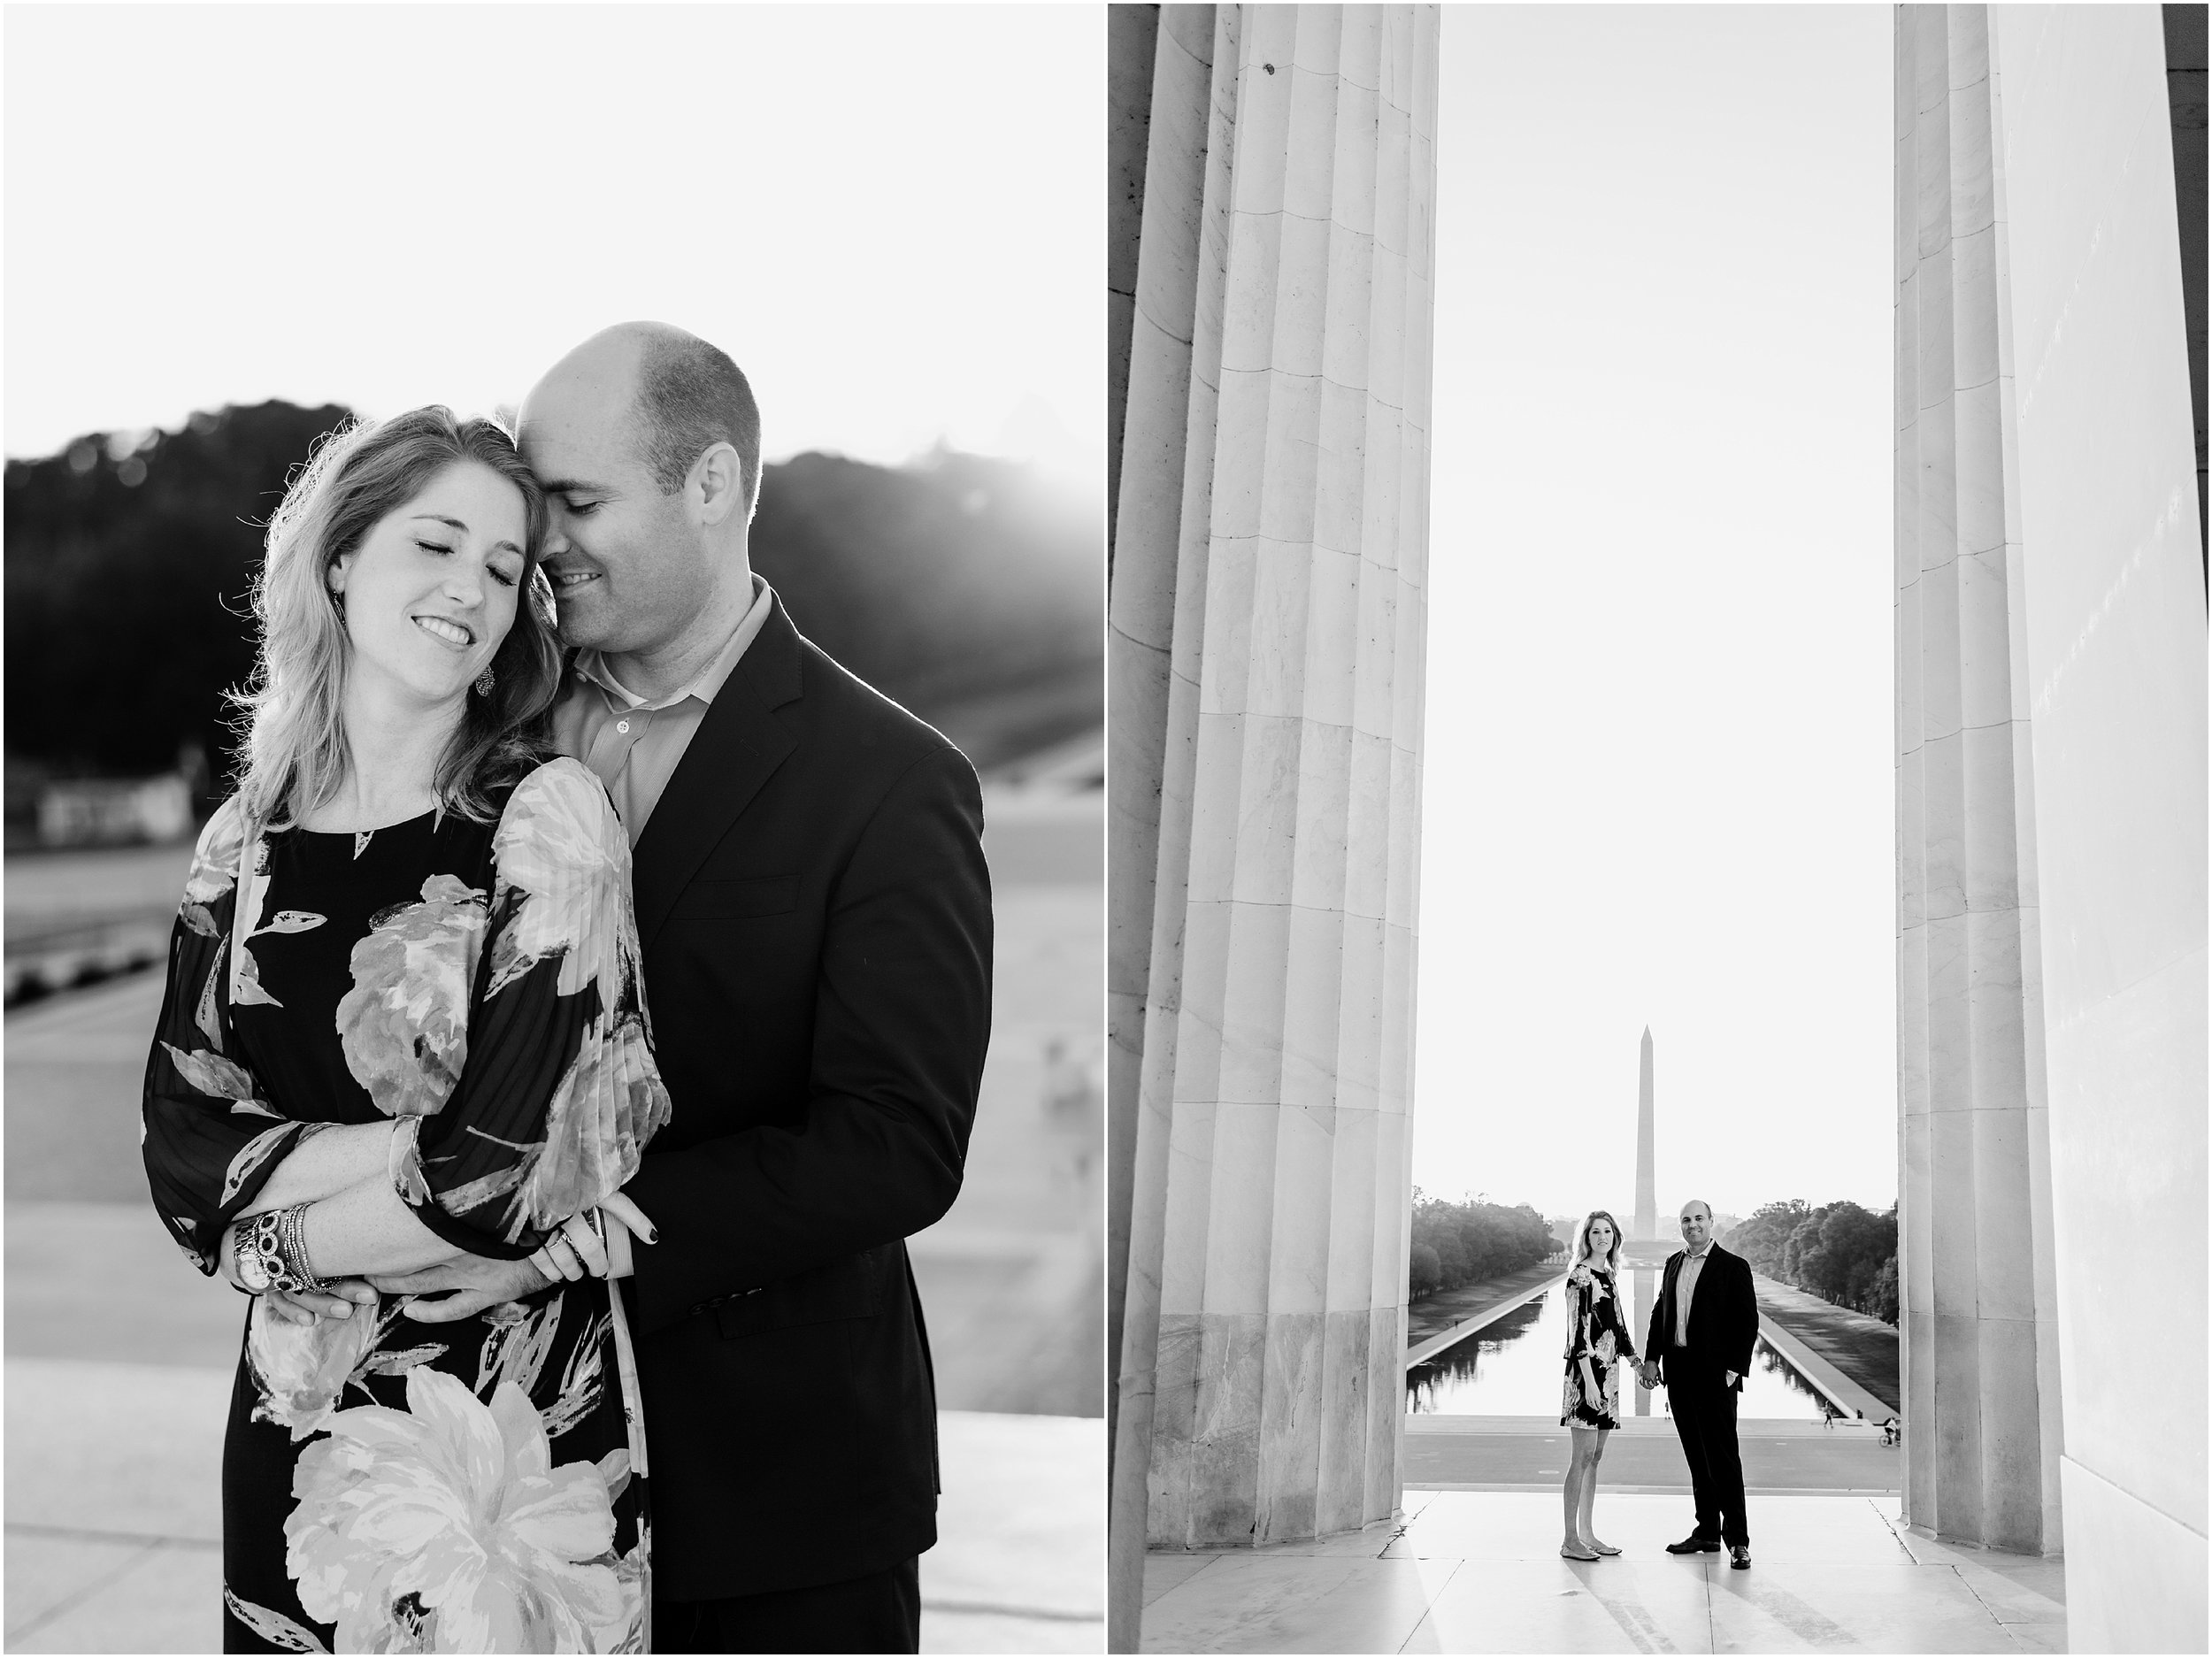 hannah leigh photography Sunrise Jefferson Memorial Engagement Session, Washington DC_1008.jpg